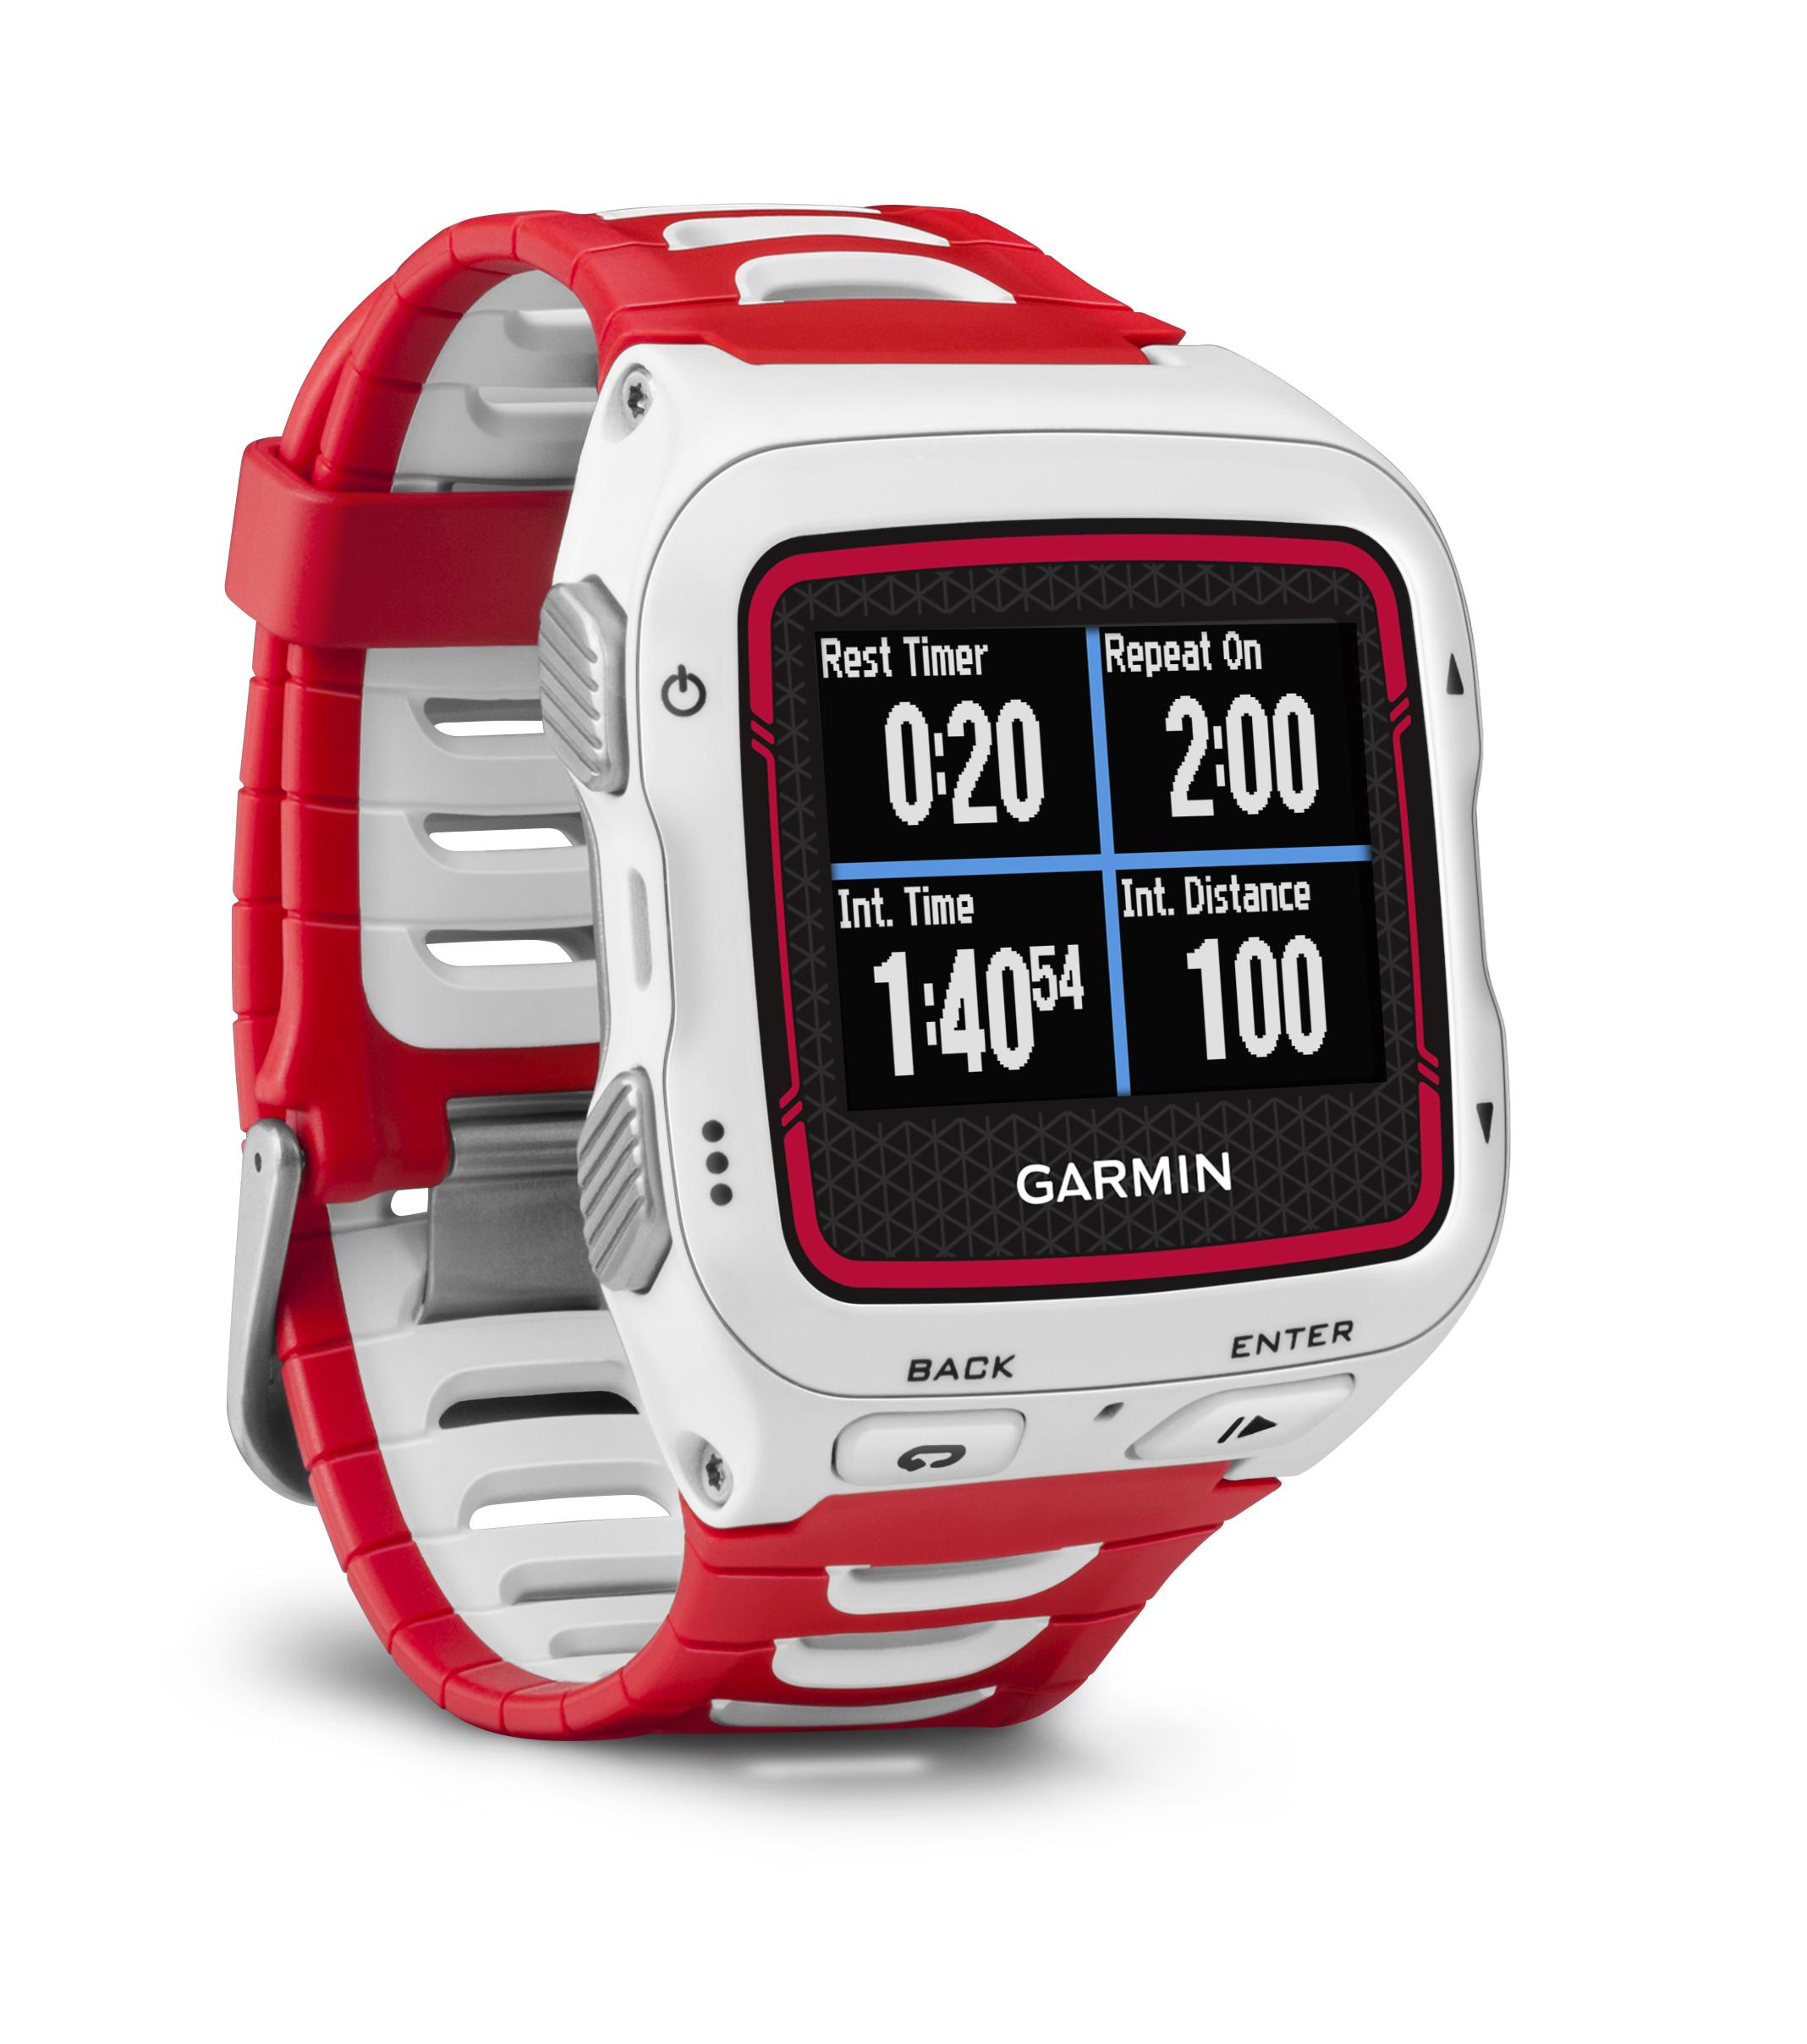 garmin montre forerunner 920 xt rouge capteur cardiaque hrm run. Black Bedroom Furniture Sets. Home Design Ideas